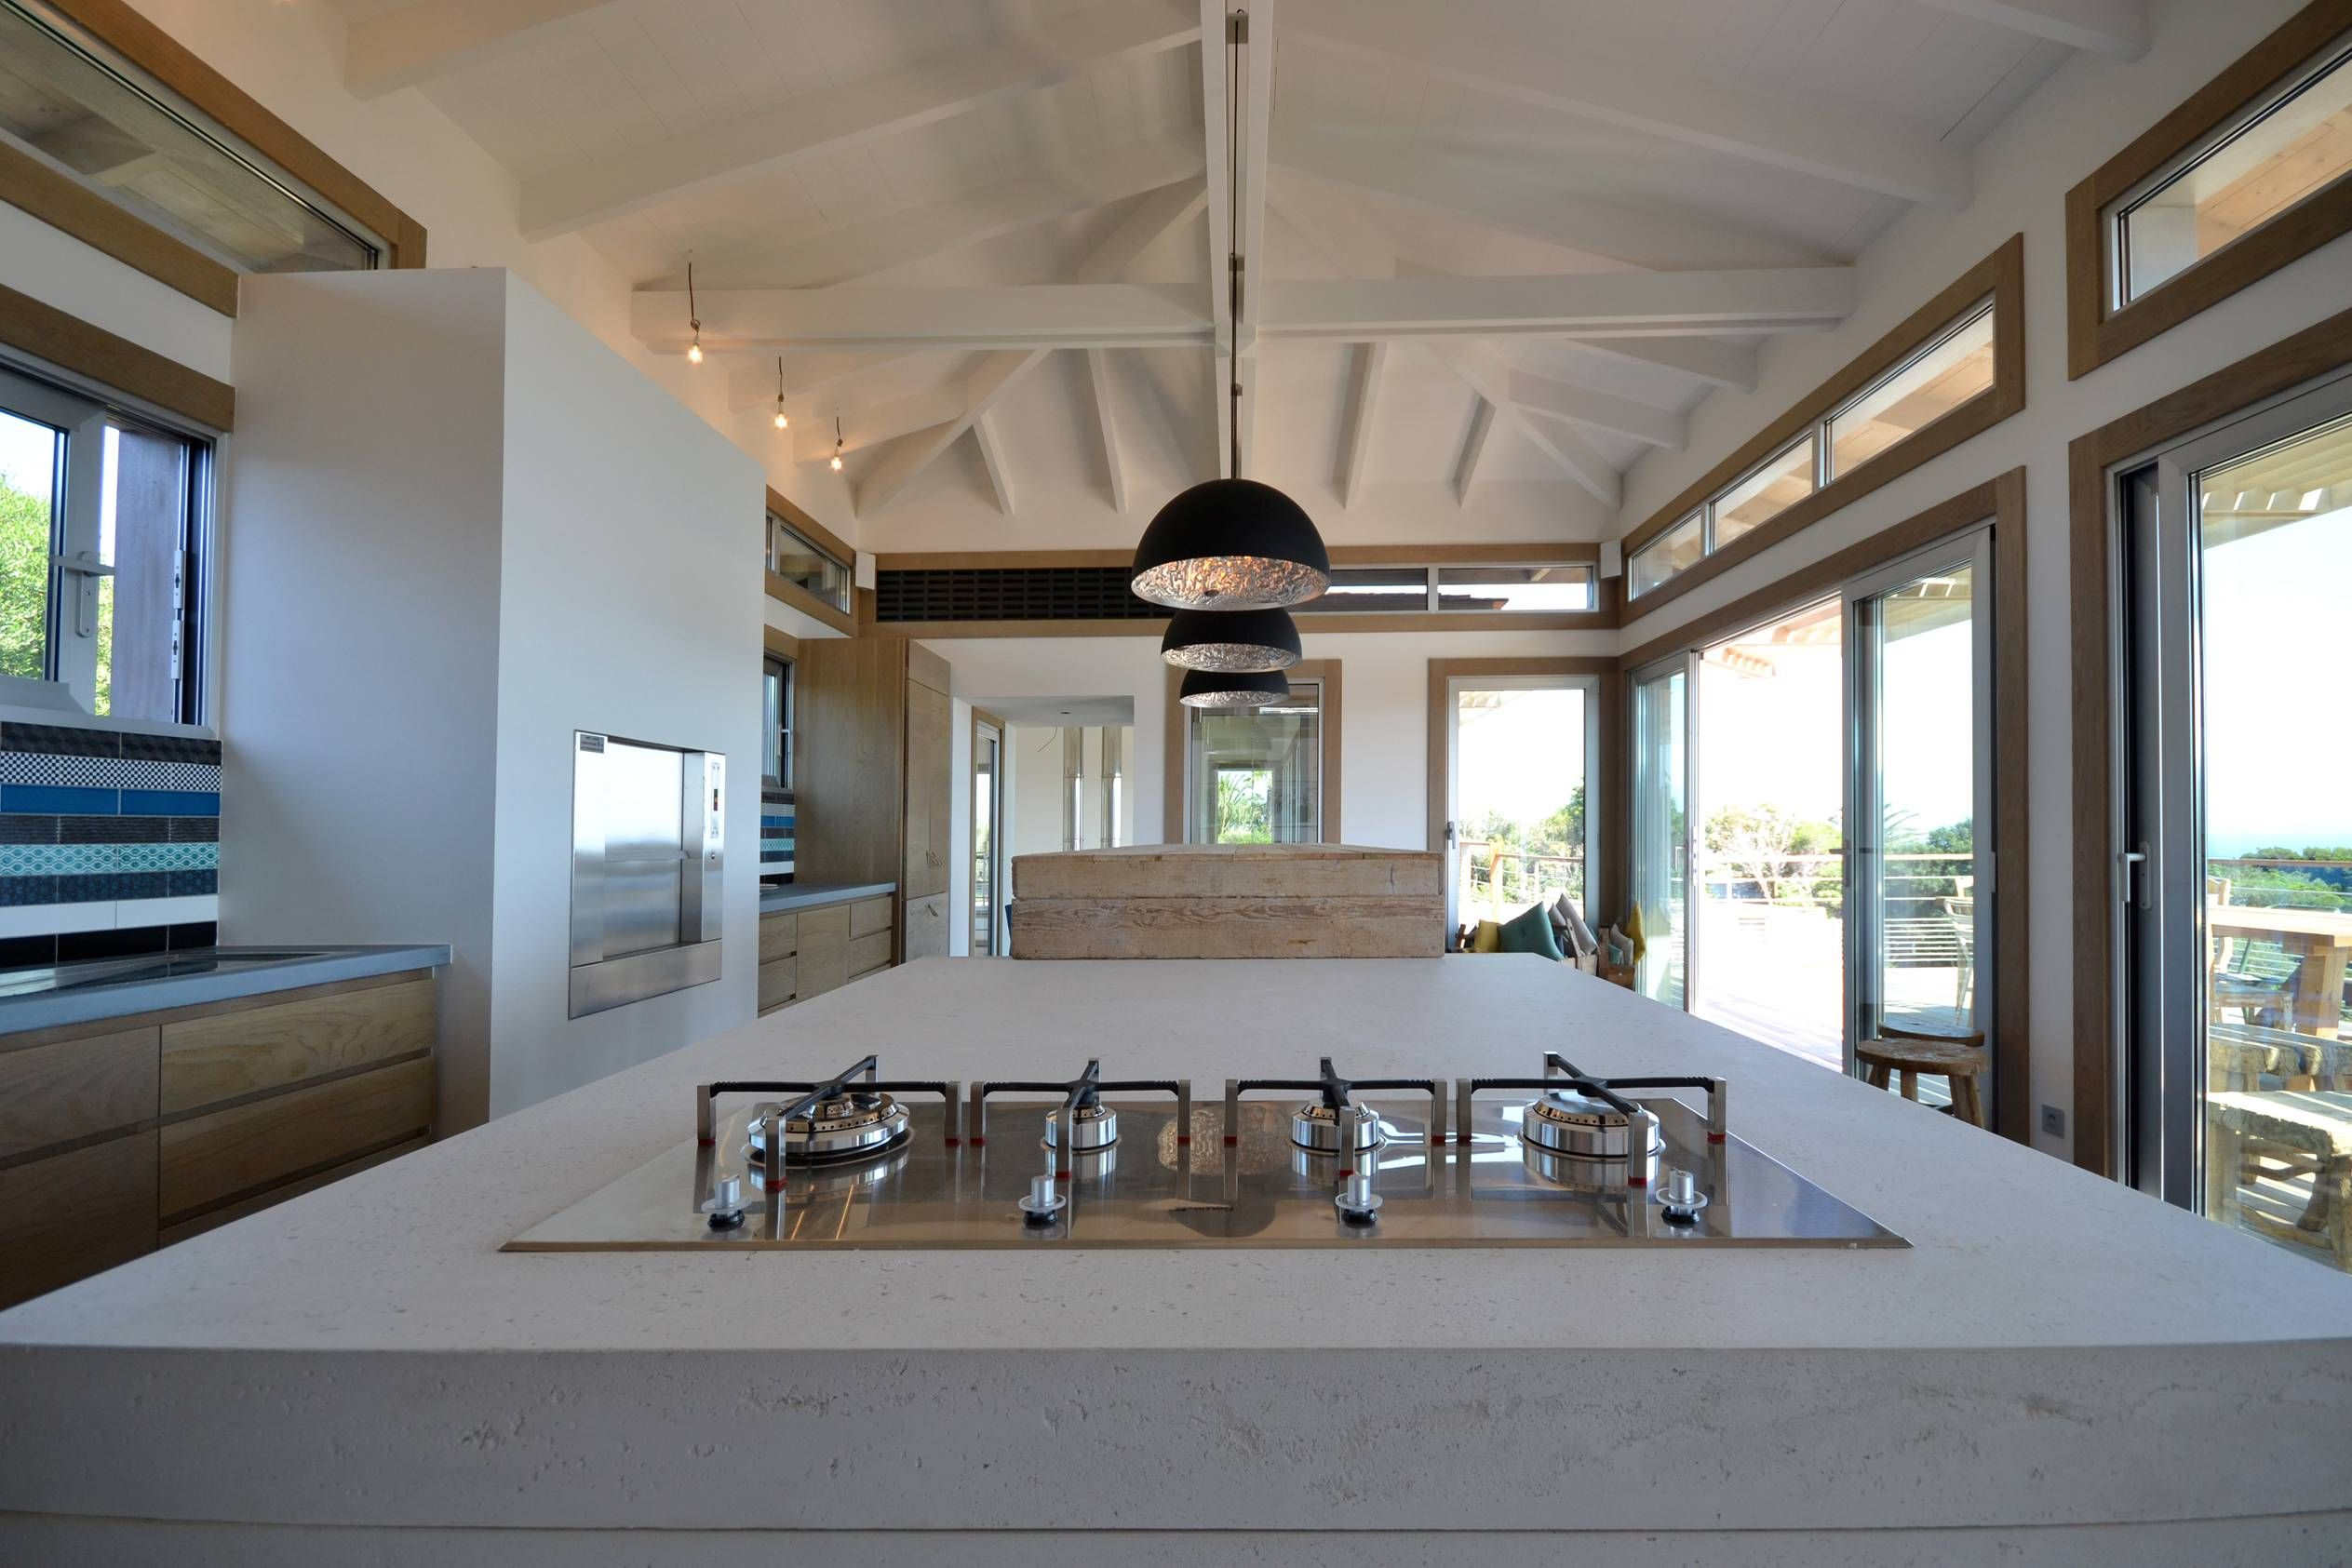 Plan De Travail Et Salle De Bains En Beton Sperone